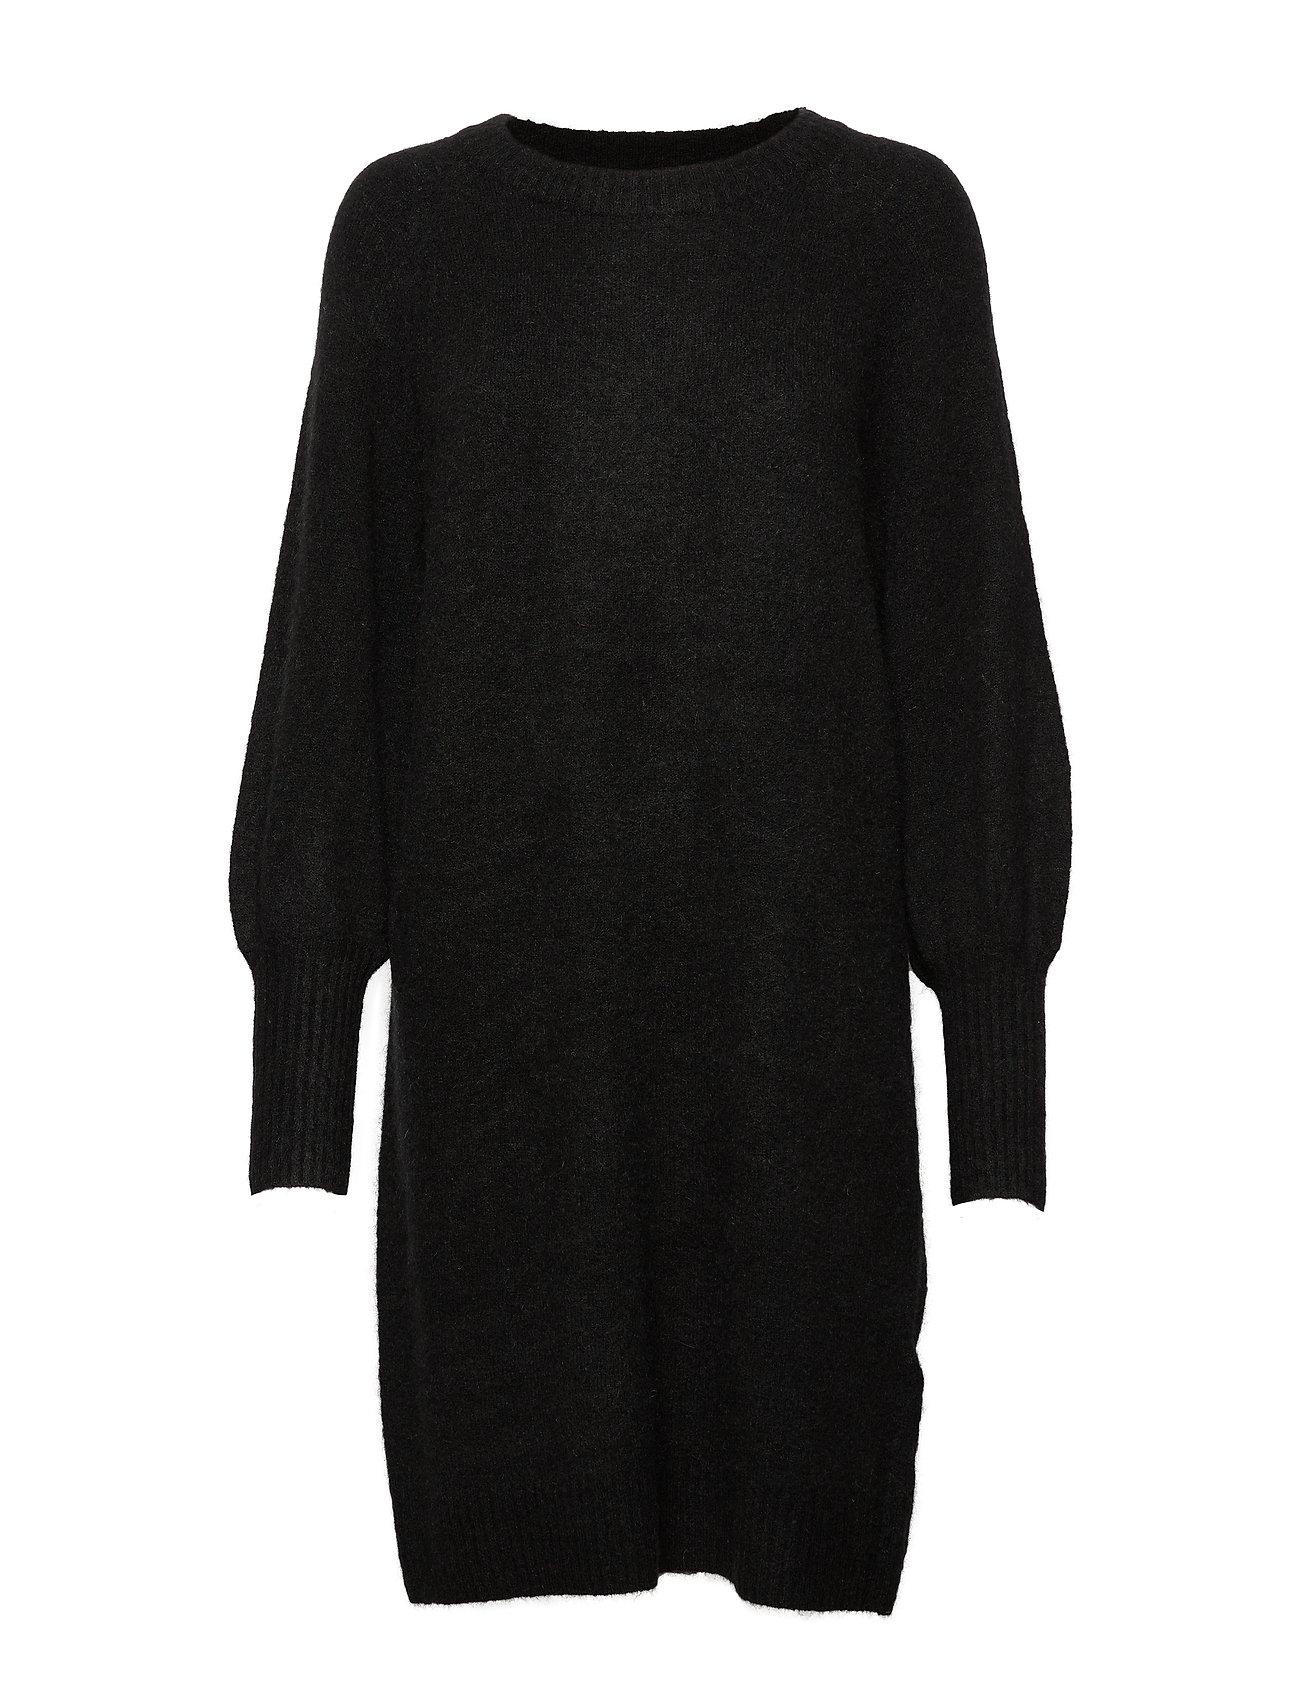 Selected Femme SLFKYLIE LS KNIT DRESS B - BLACK